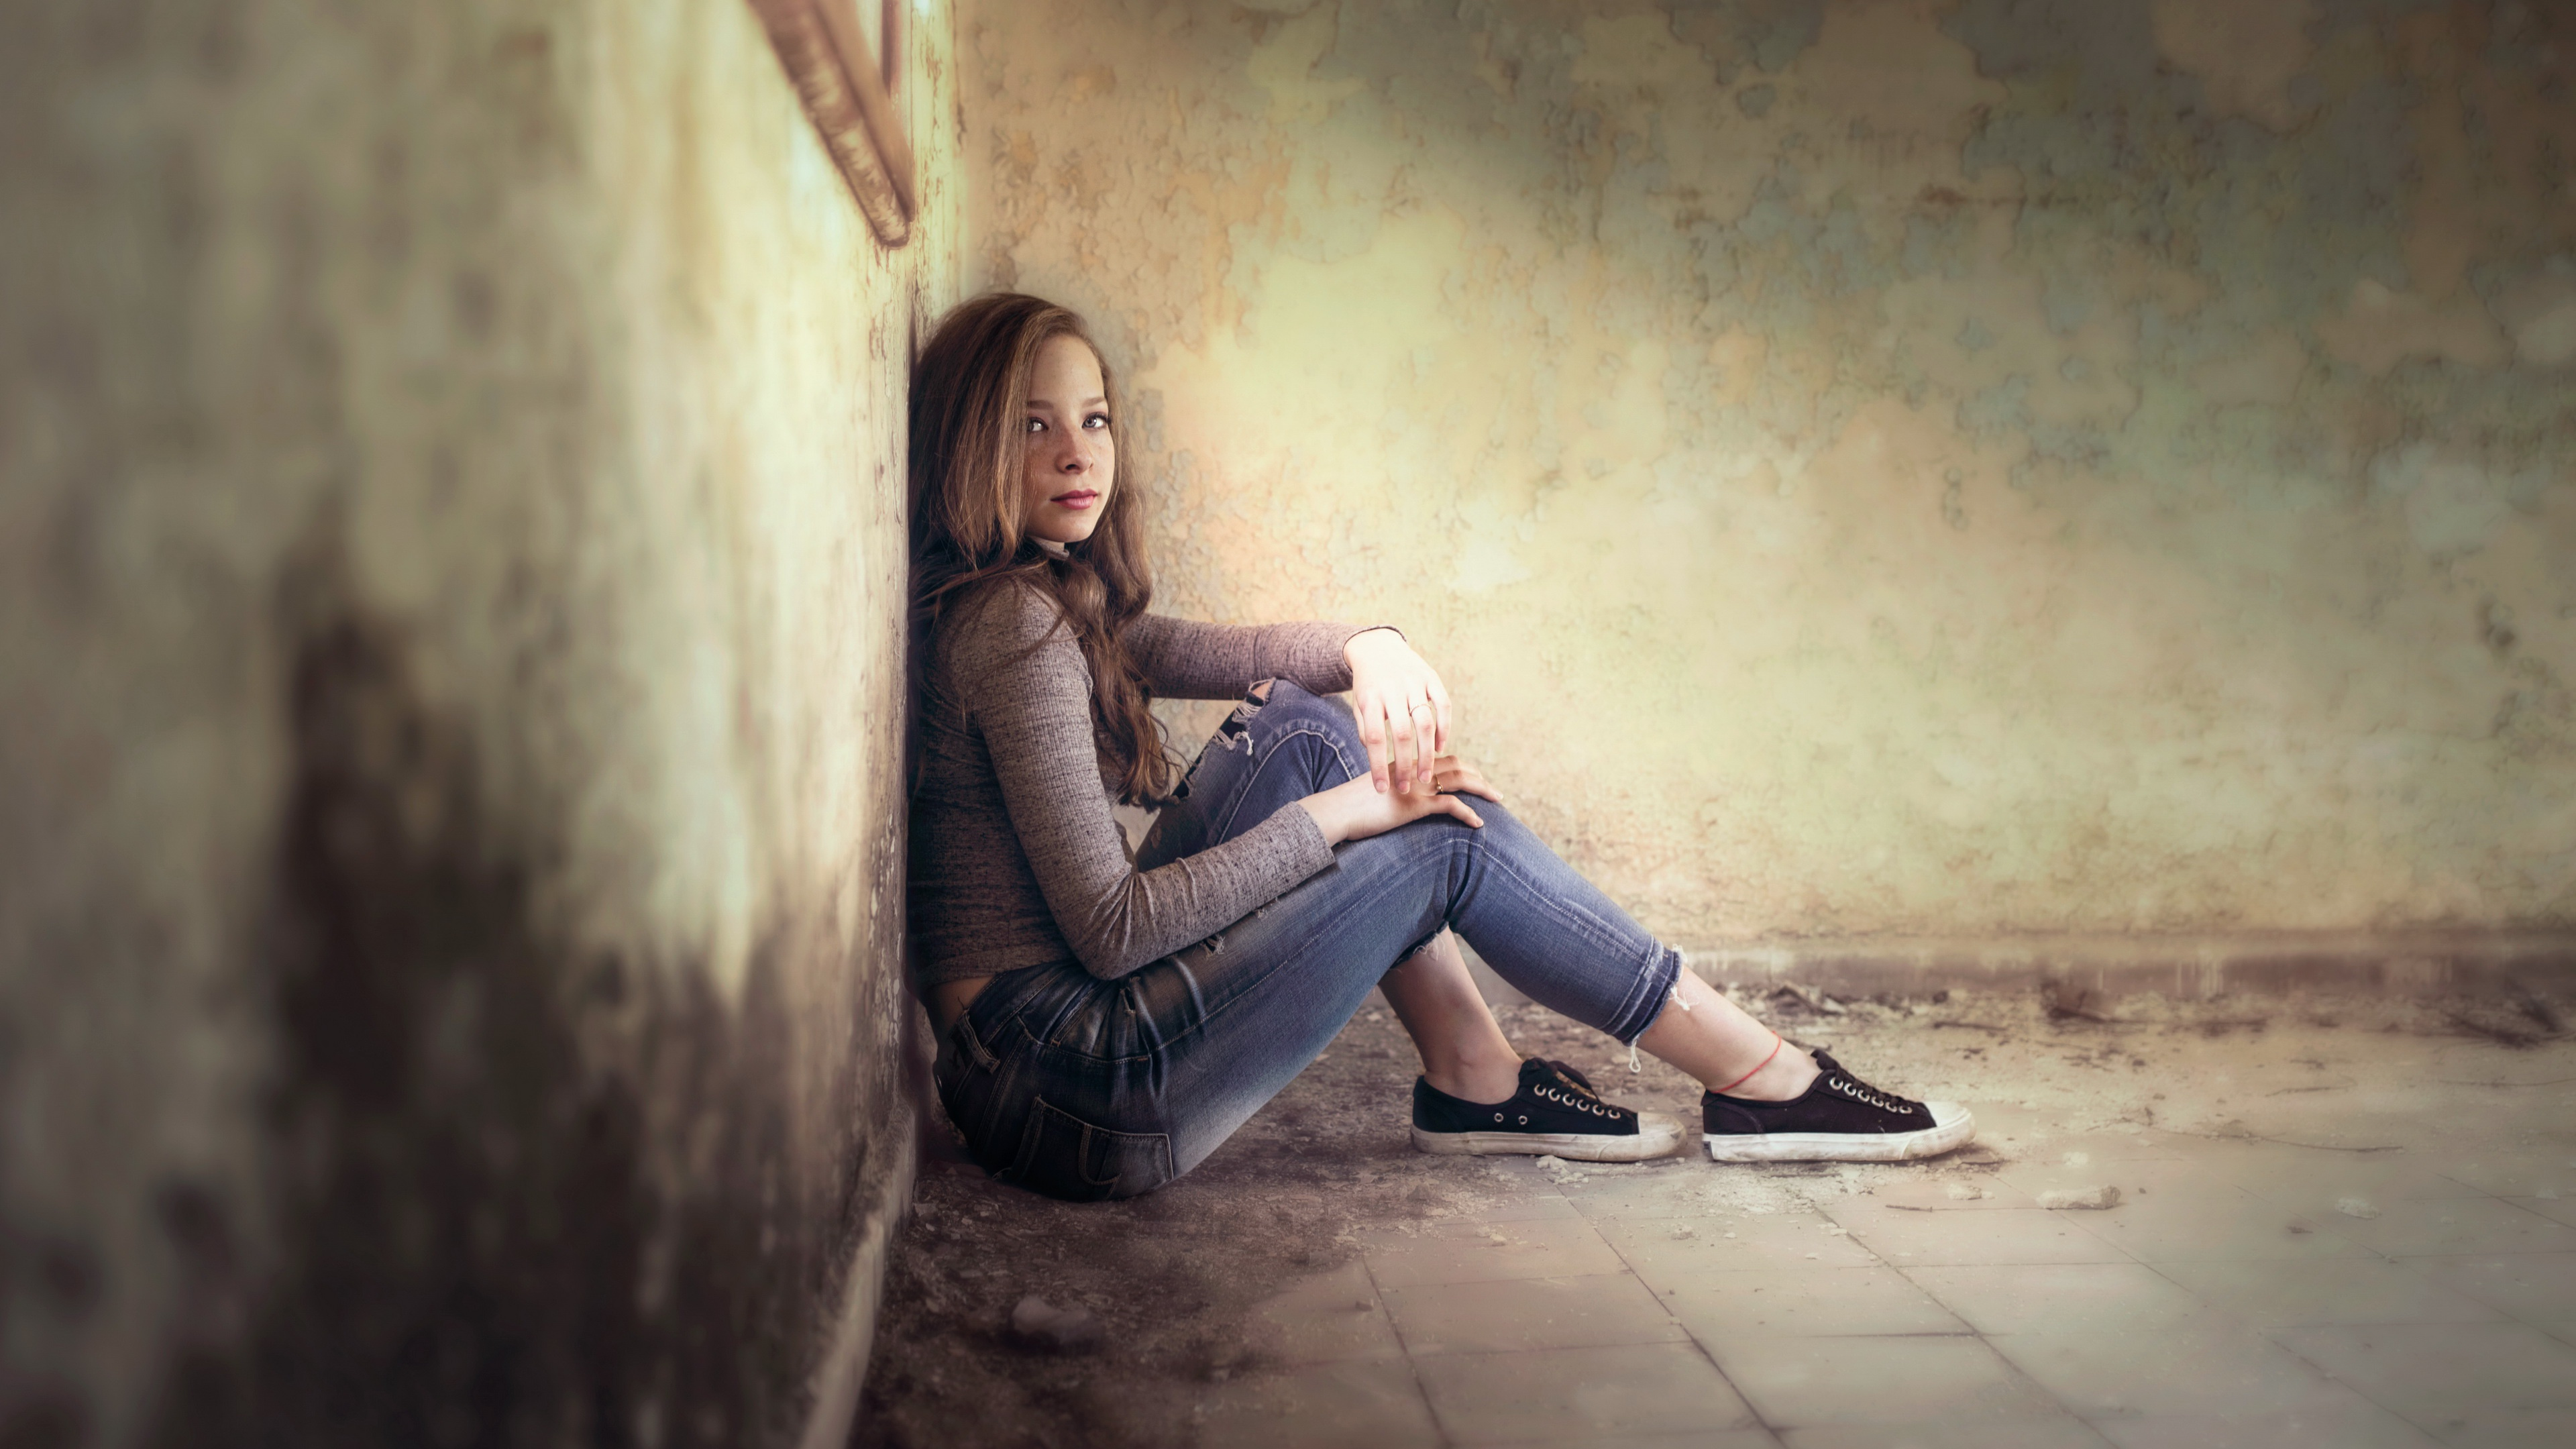 Women Model Indoors Women Indoors Sitting Abandoned Looking At Viewer Brunette Jeans Sneakers 3840x2160